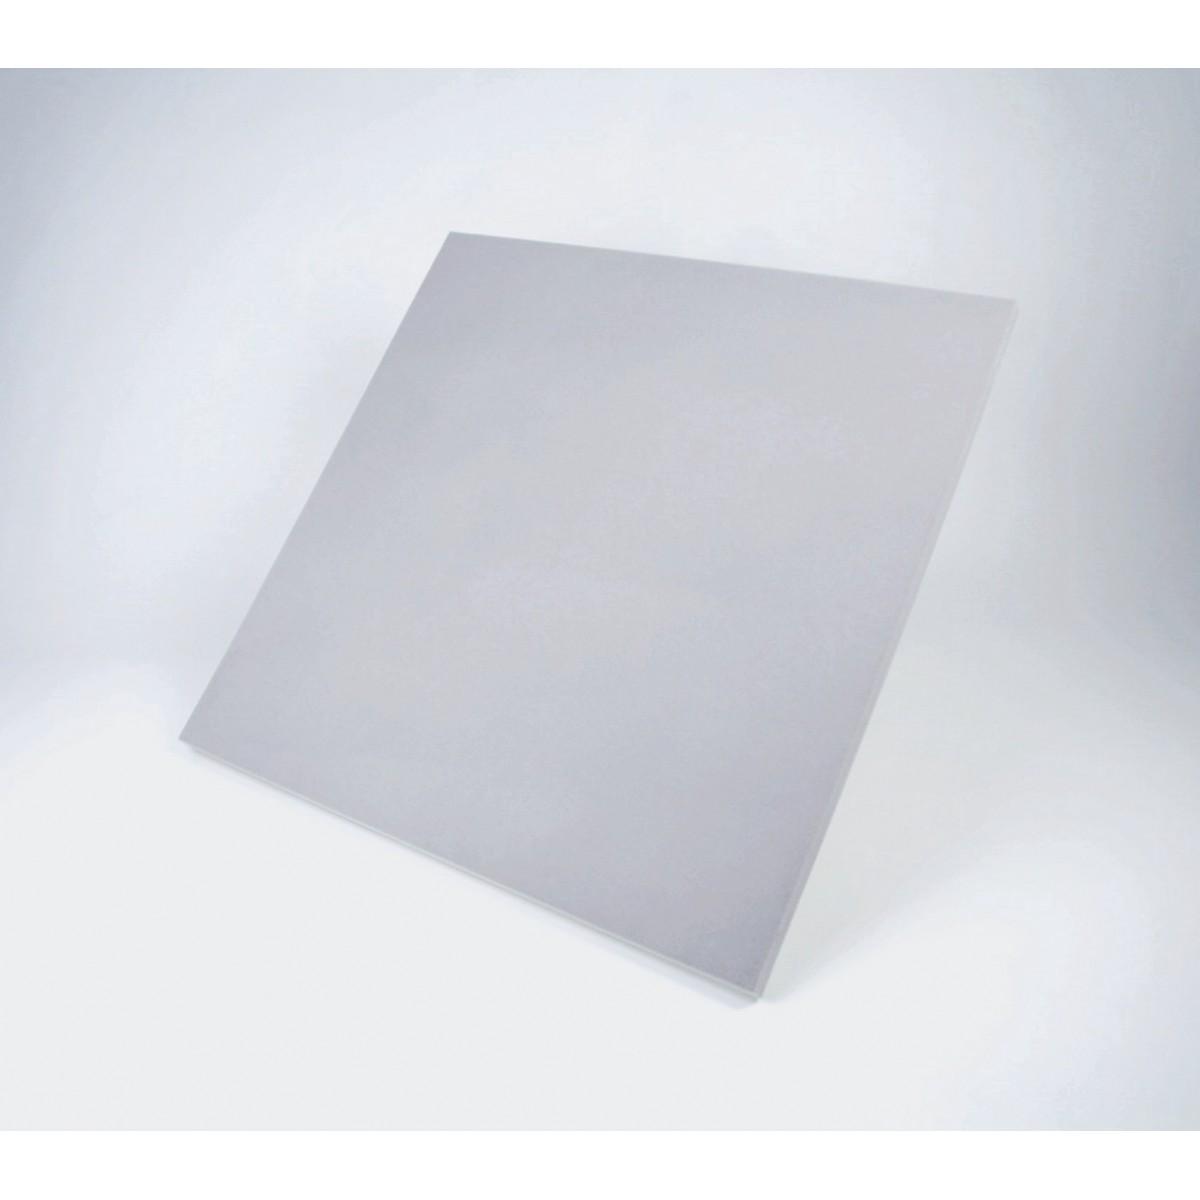 Regular Panel 60.2 Premiere White (Ref 101)